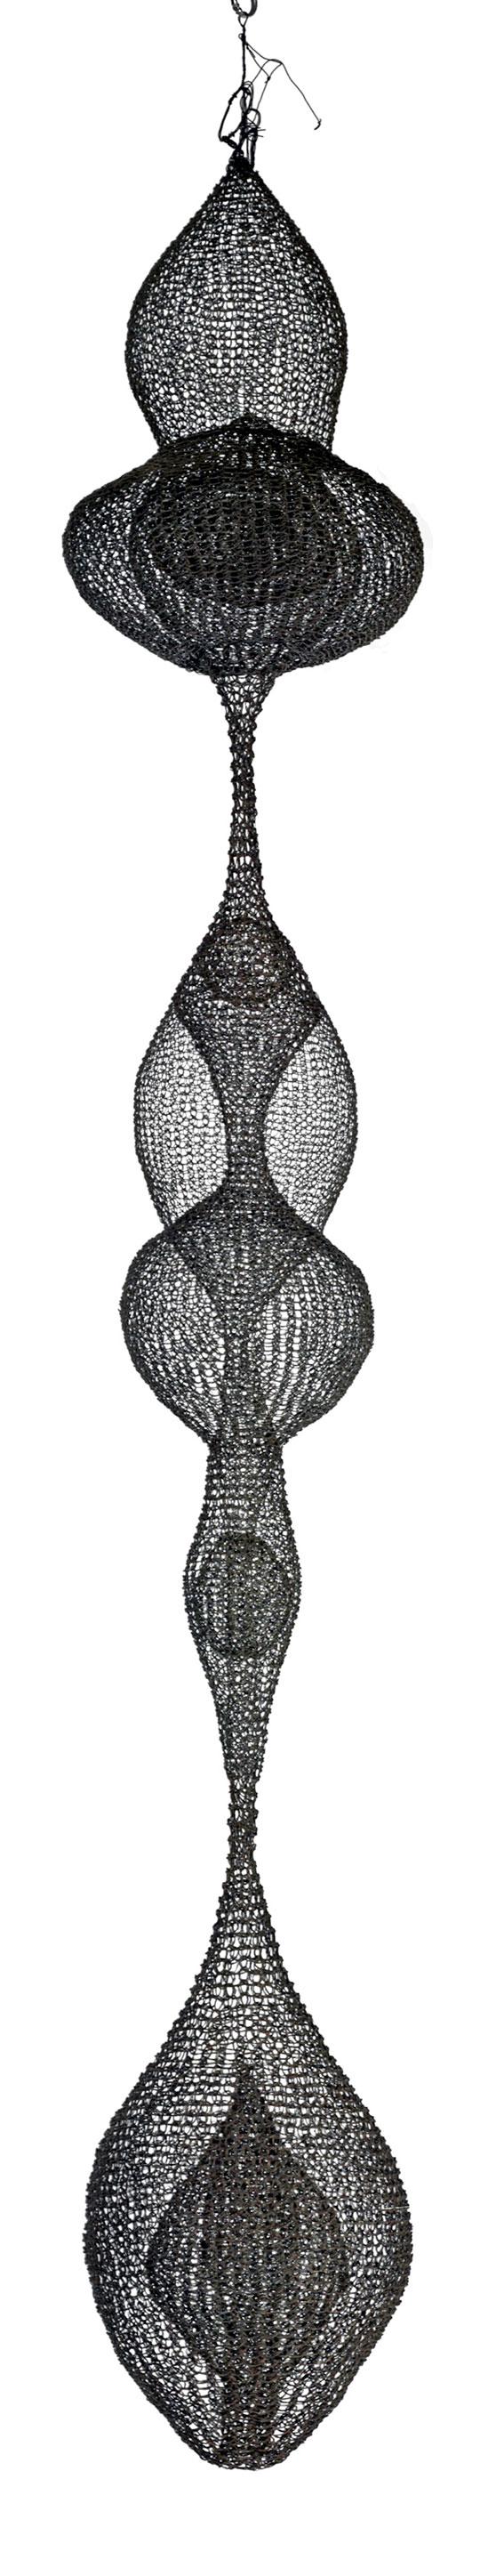 Sculpture | Ruth Asawa: Line as Form « Pedro Silmon The Blog